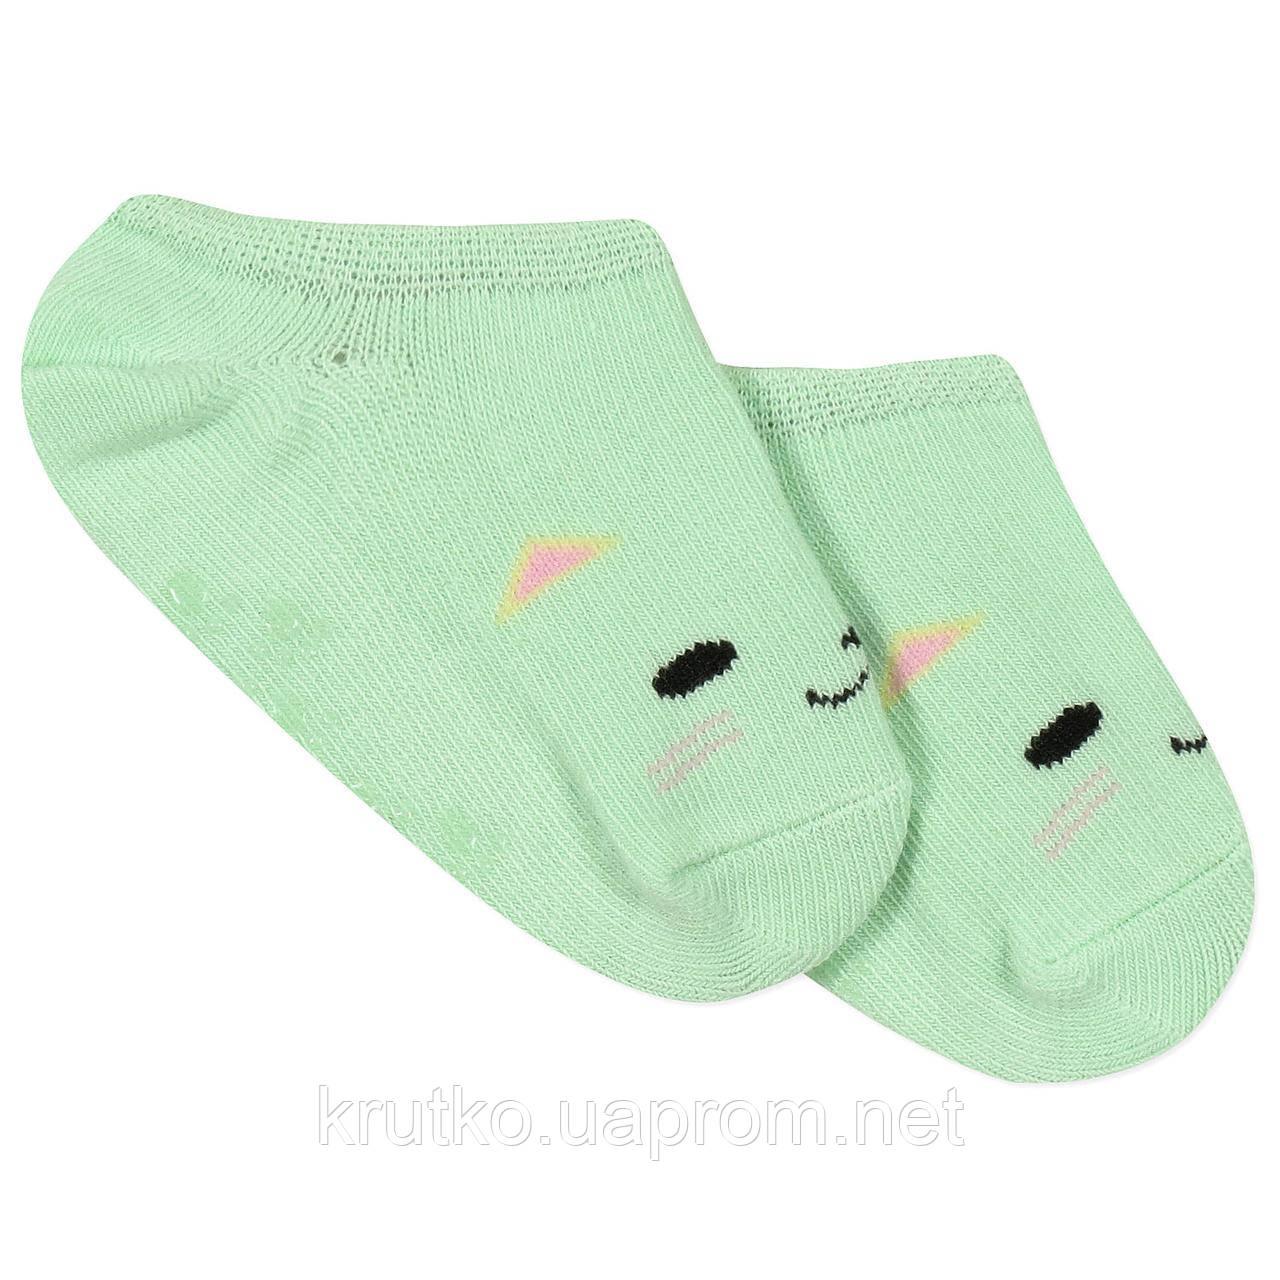 Детские антискользящие носки Кот Berni